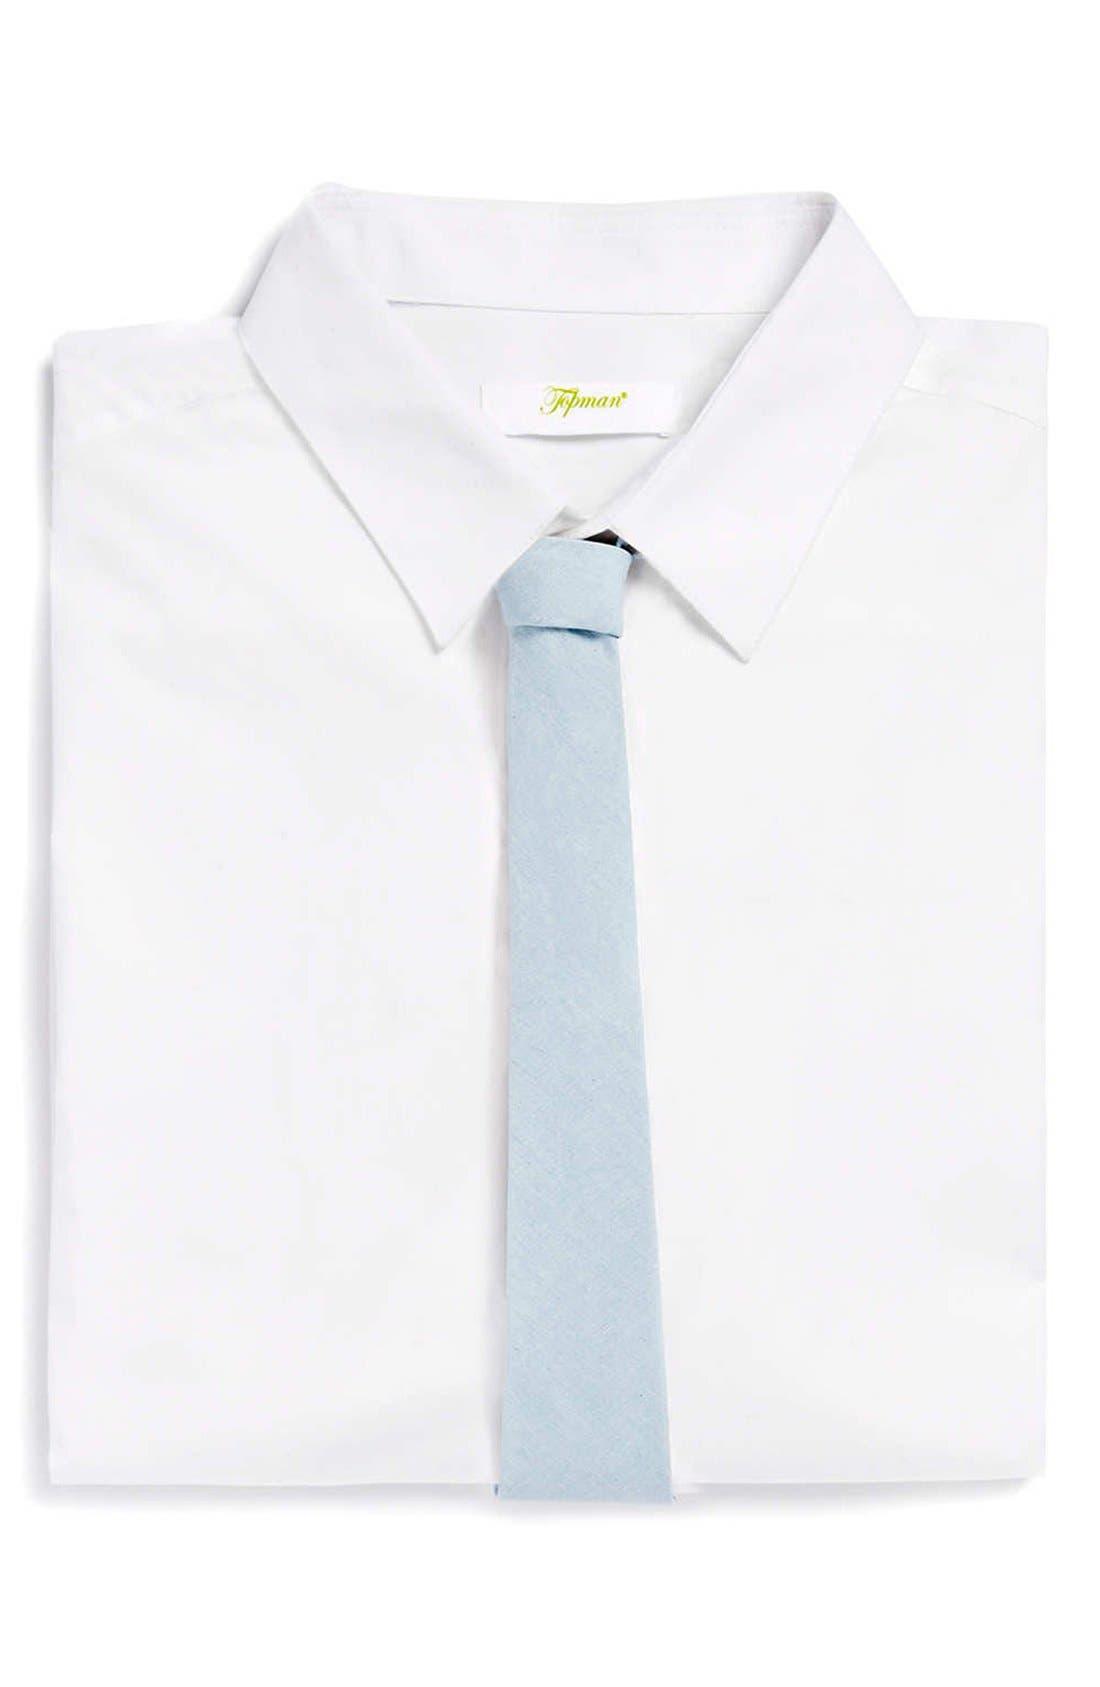 Alternate Image 1 Selected - Topman Woven Tie